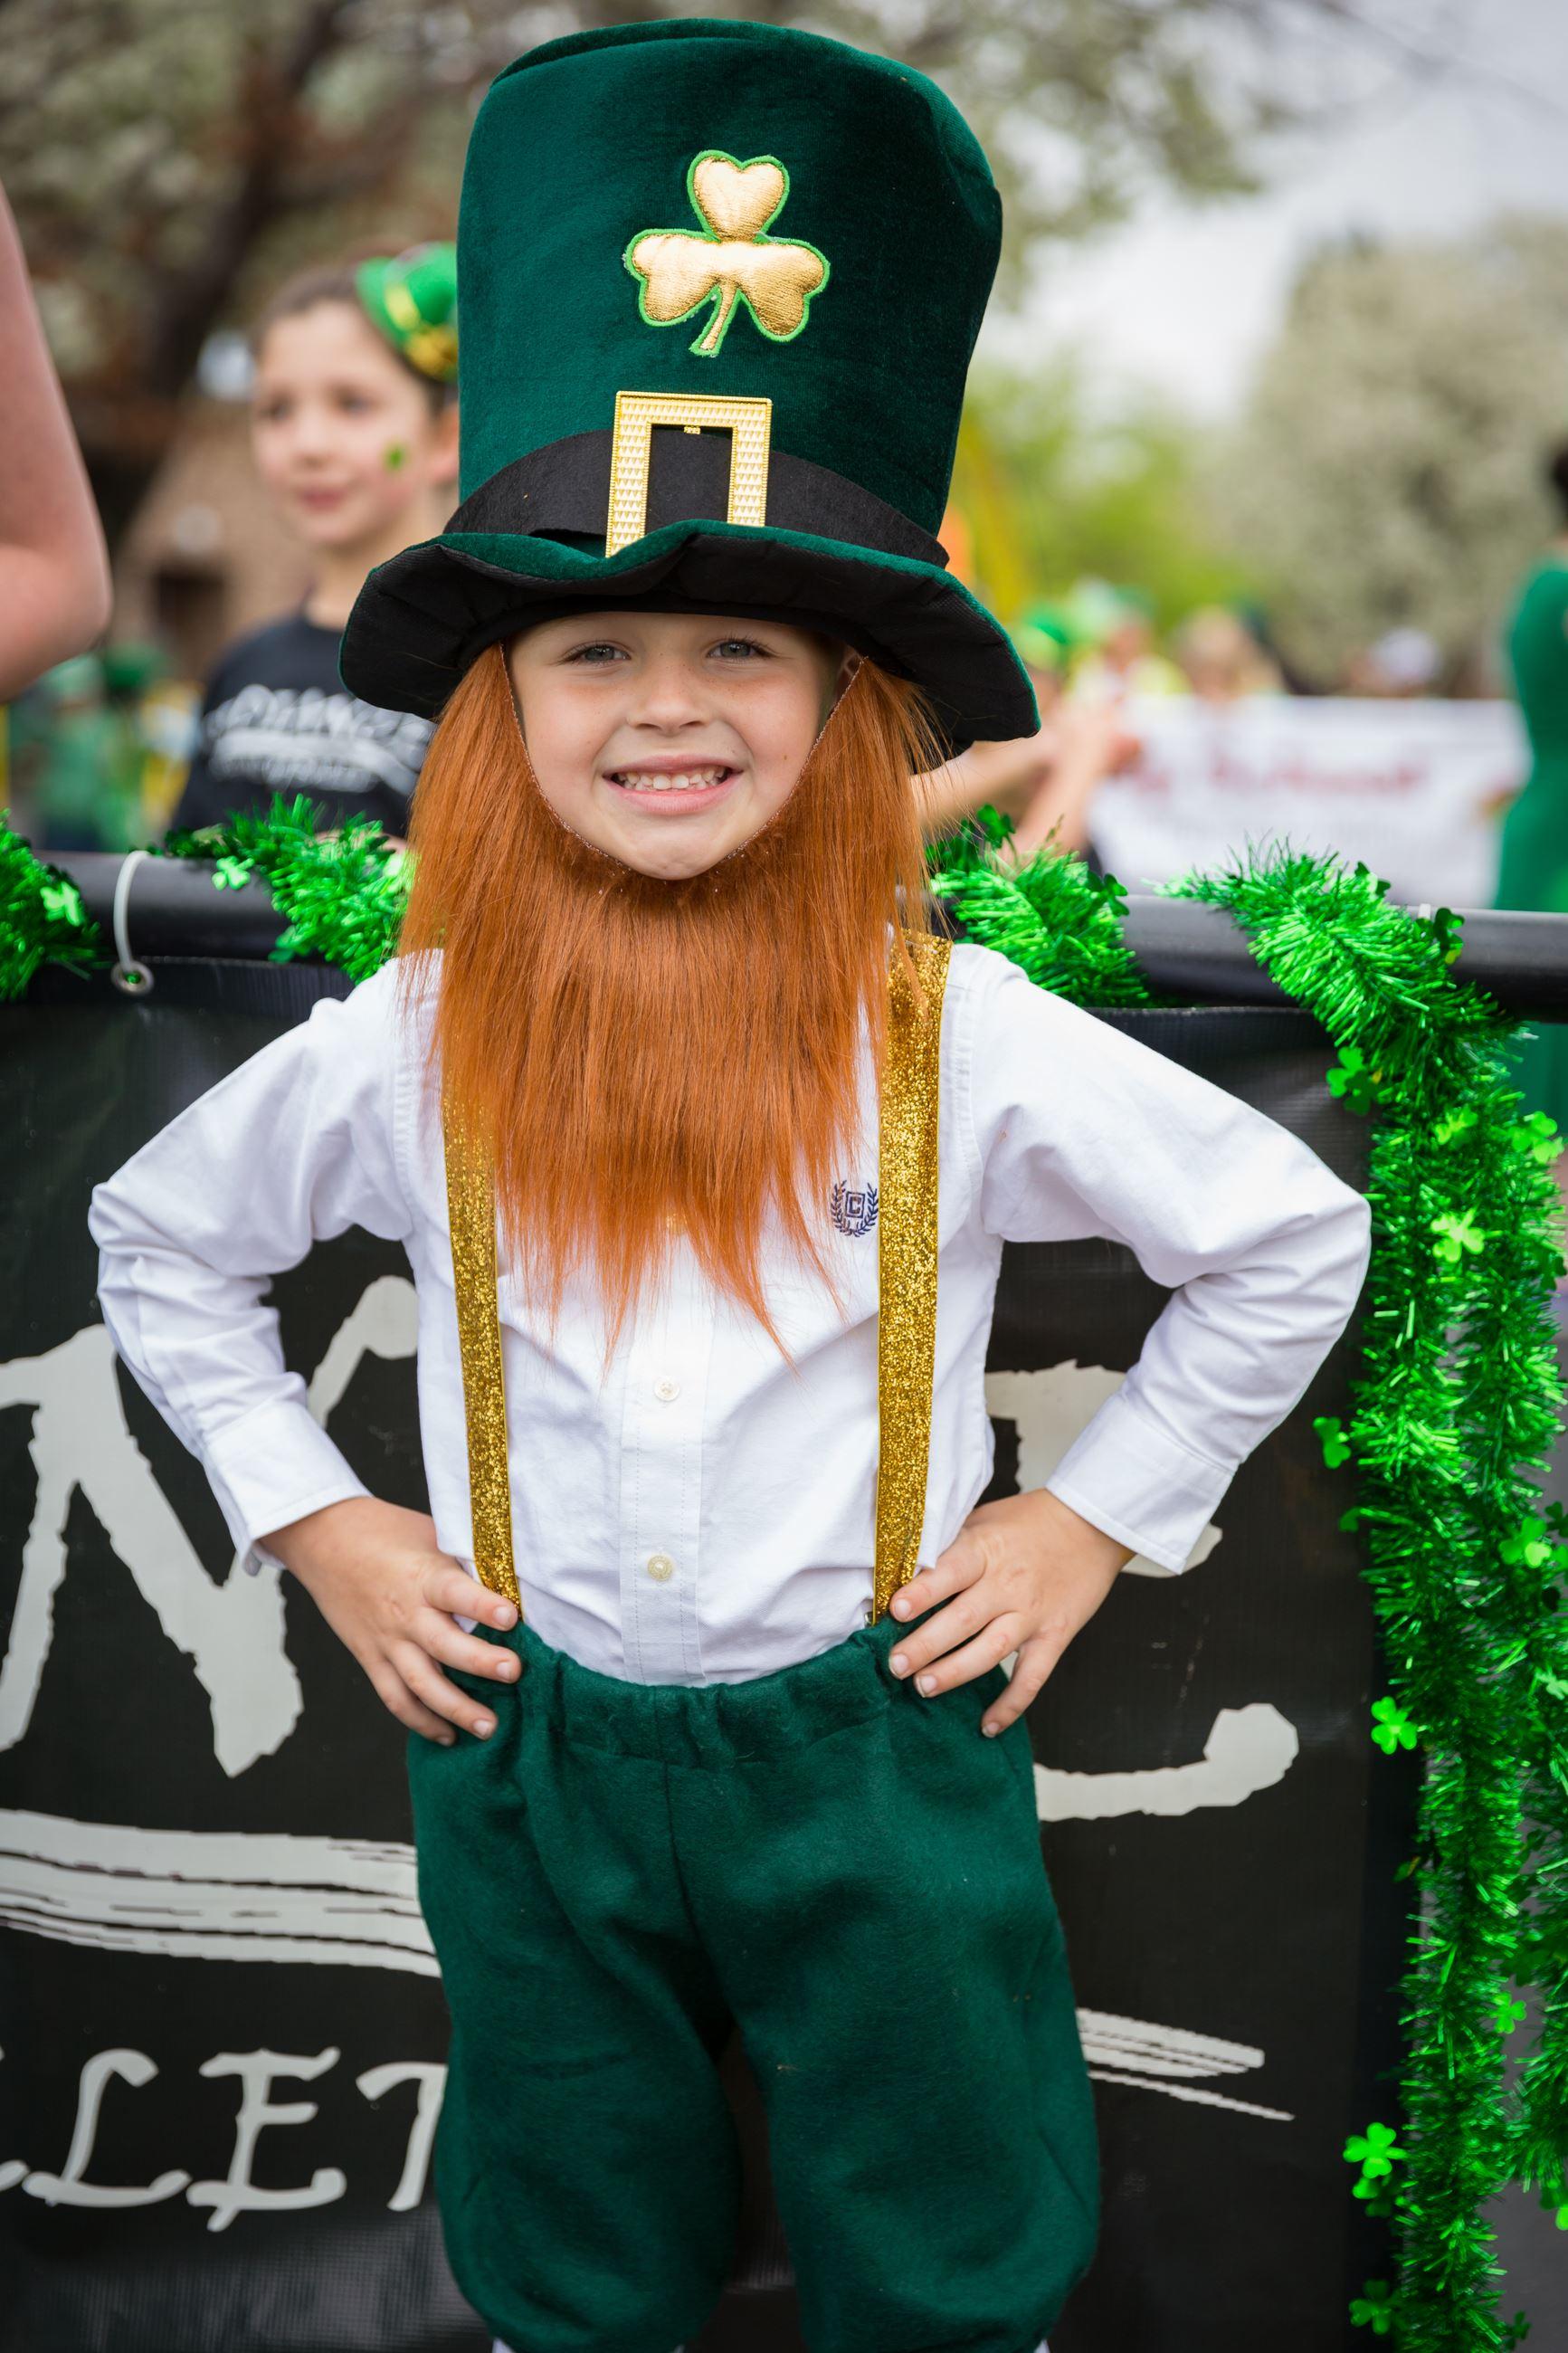 a2b3032f4 St. Patrick's Day Celebration | Dublin, CA - Official Website